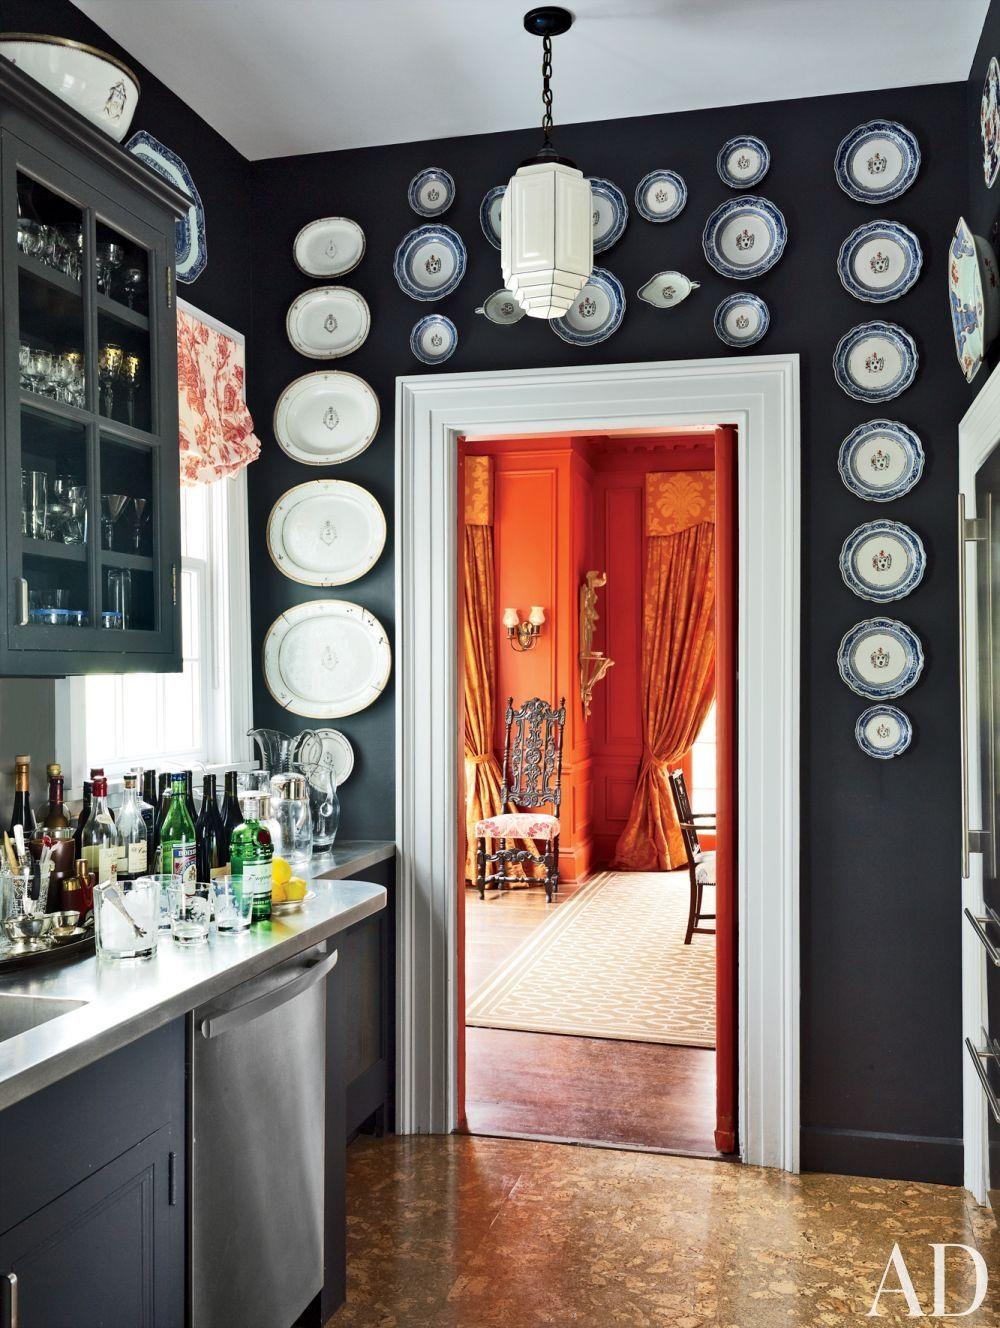 Unique Wall Decor Ideas Antique Plates Beautiful Homes Kitchen